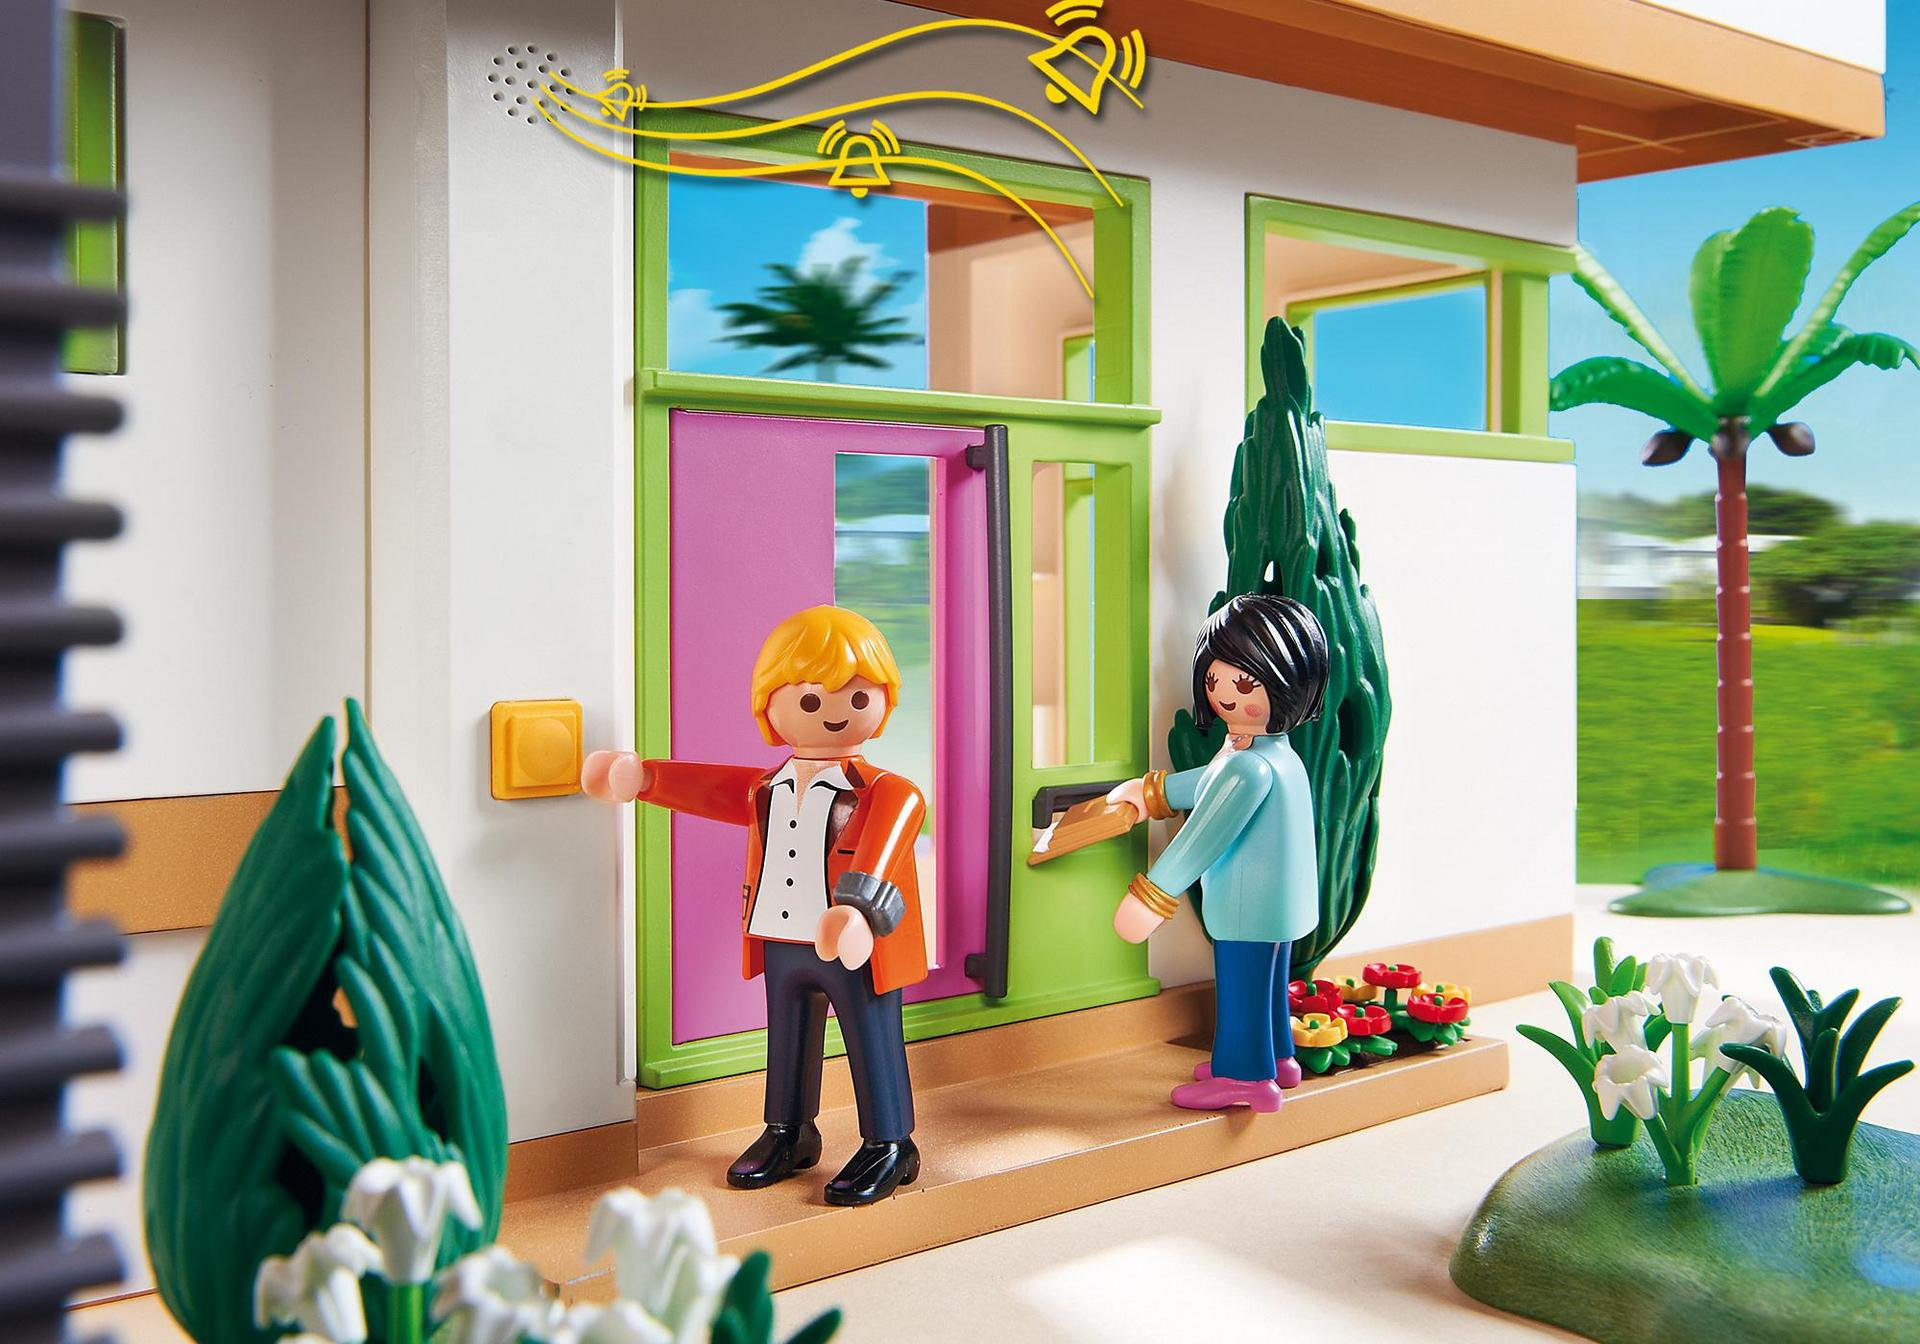 Maison moderne 5574 playmobil france for Mansion de playmobil